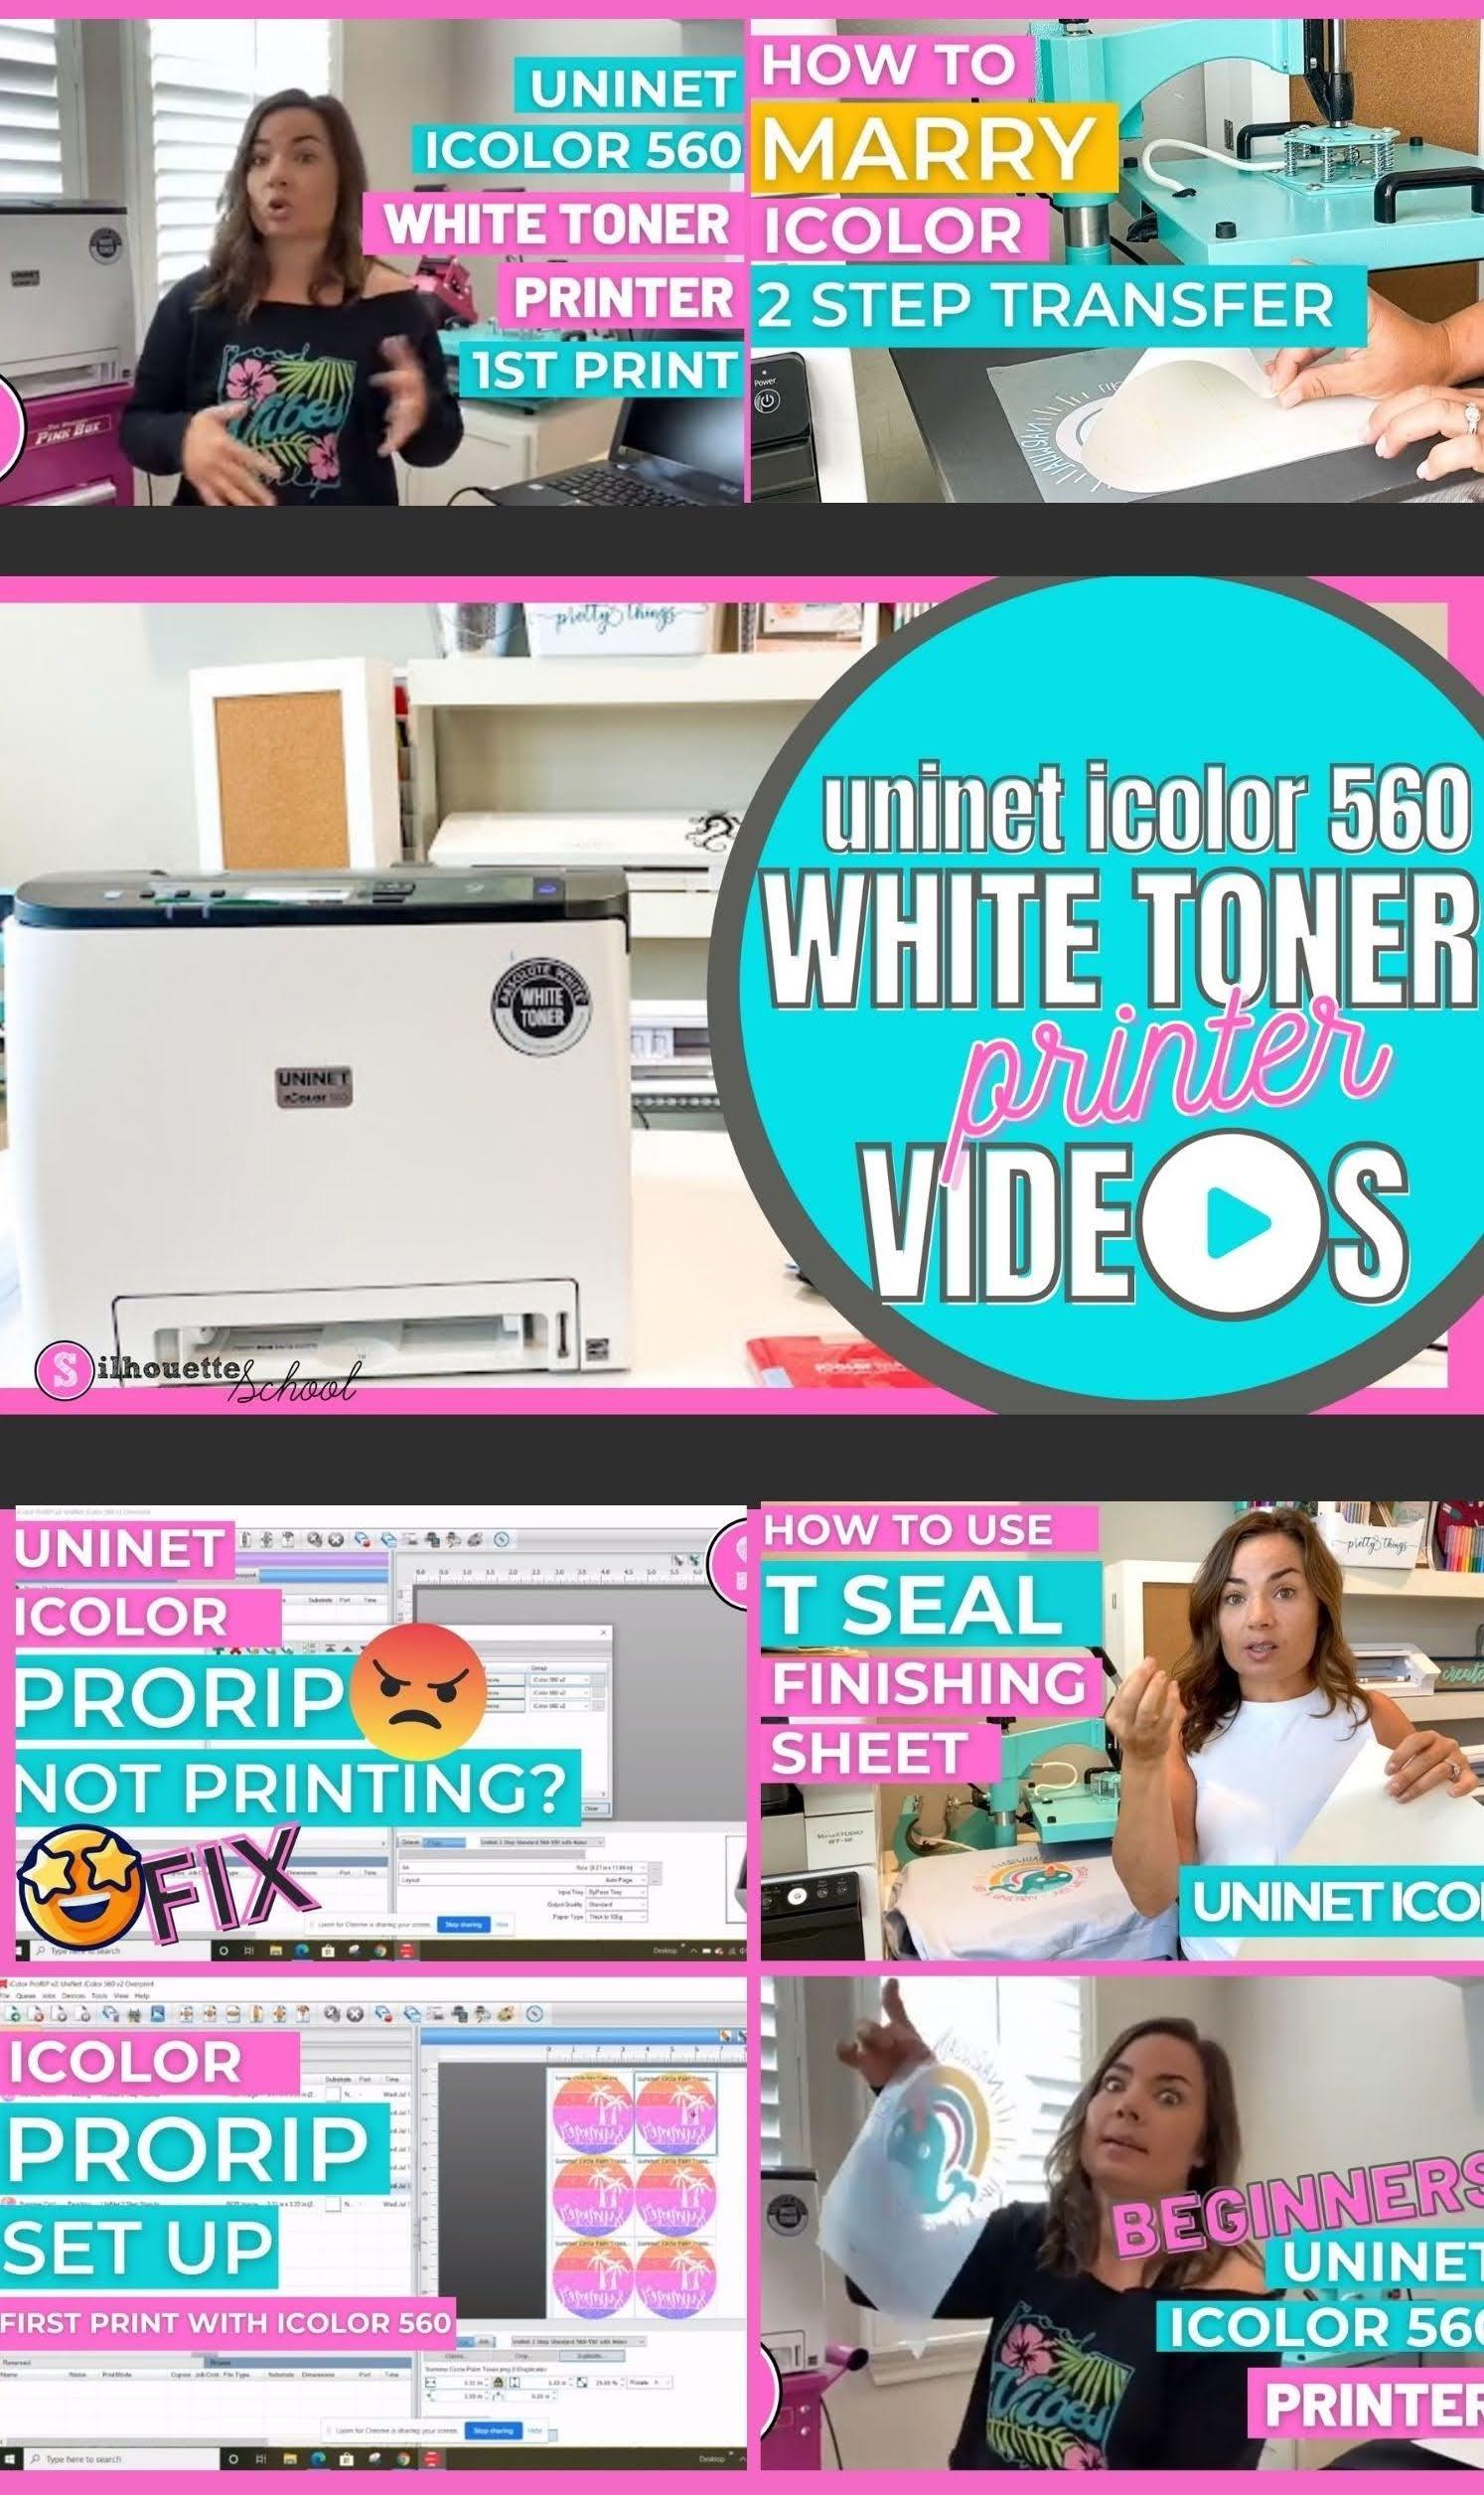 Uninet iColor 560 beginner videos